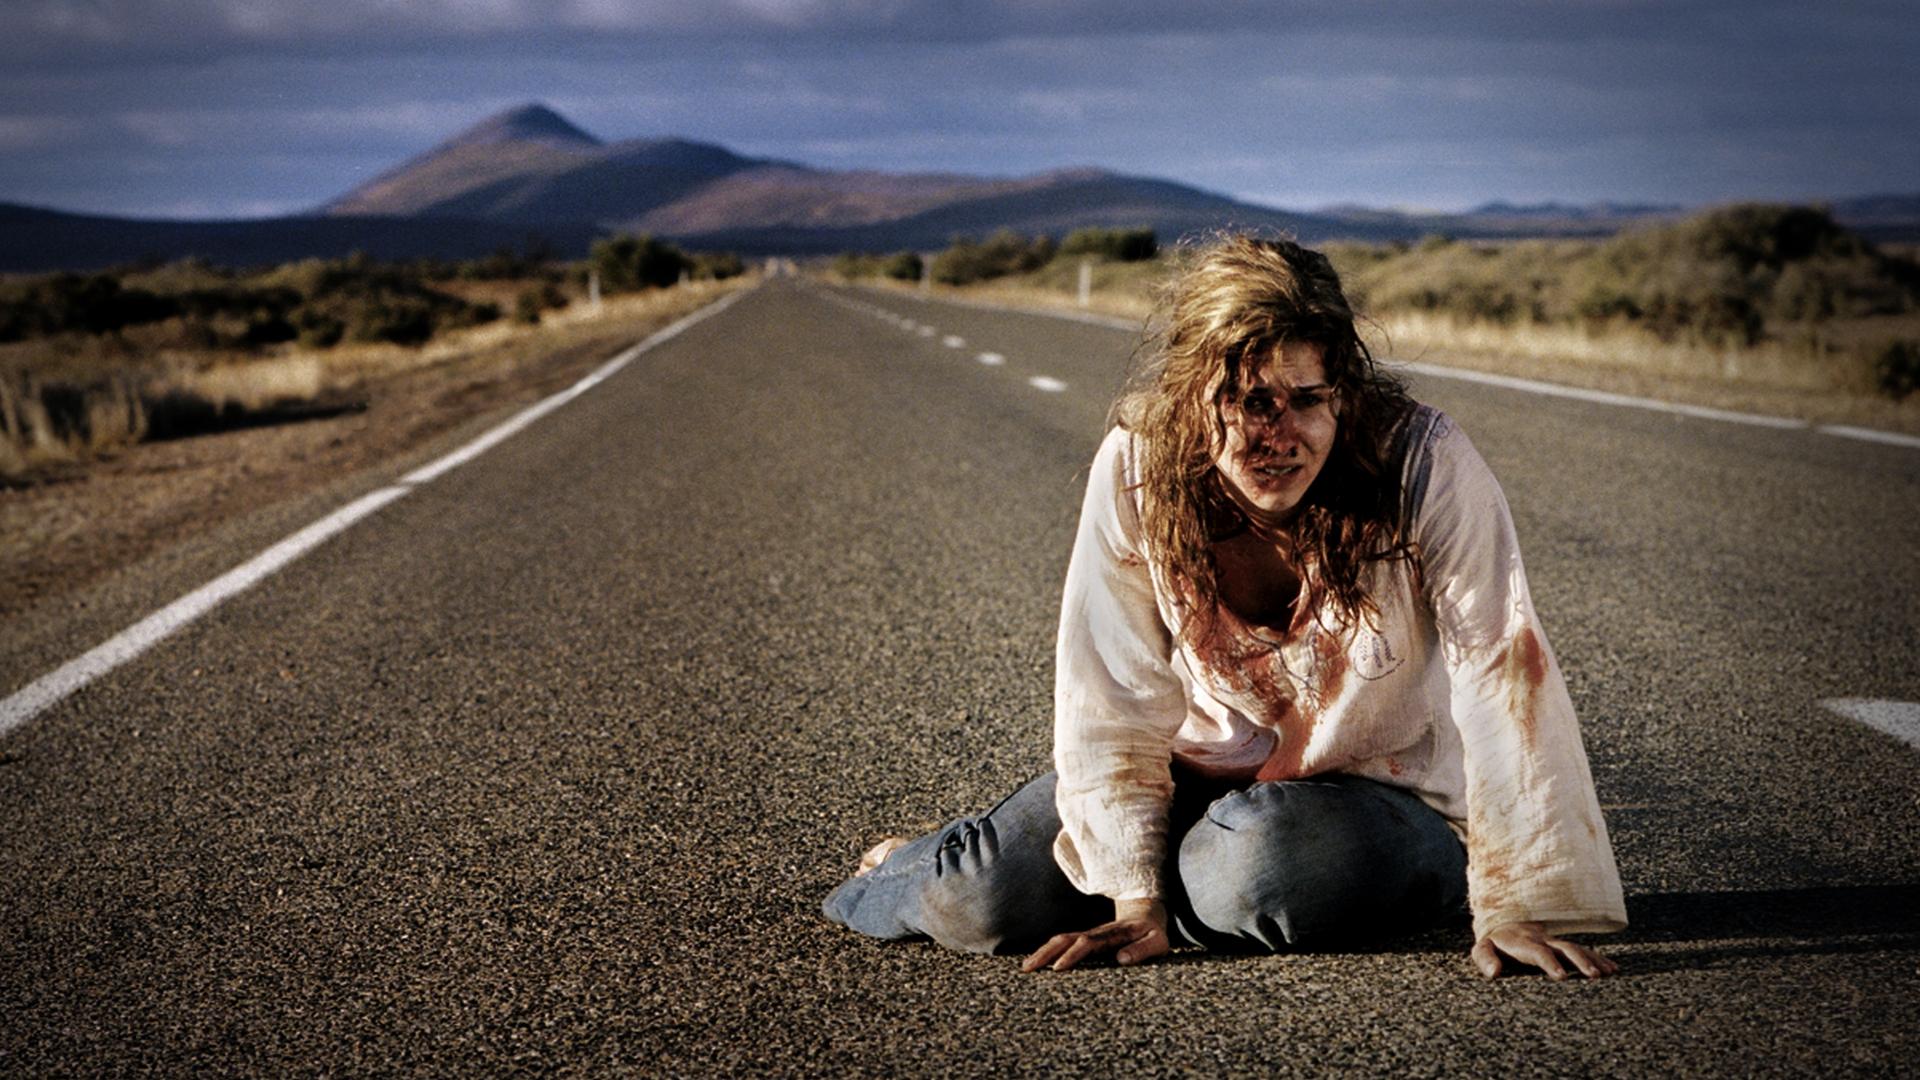 The 11 Most Frightening Australian Horror & Thriller Films